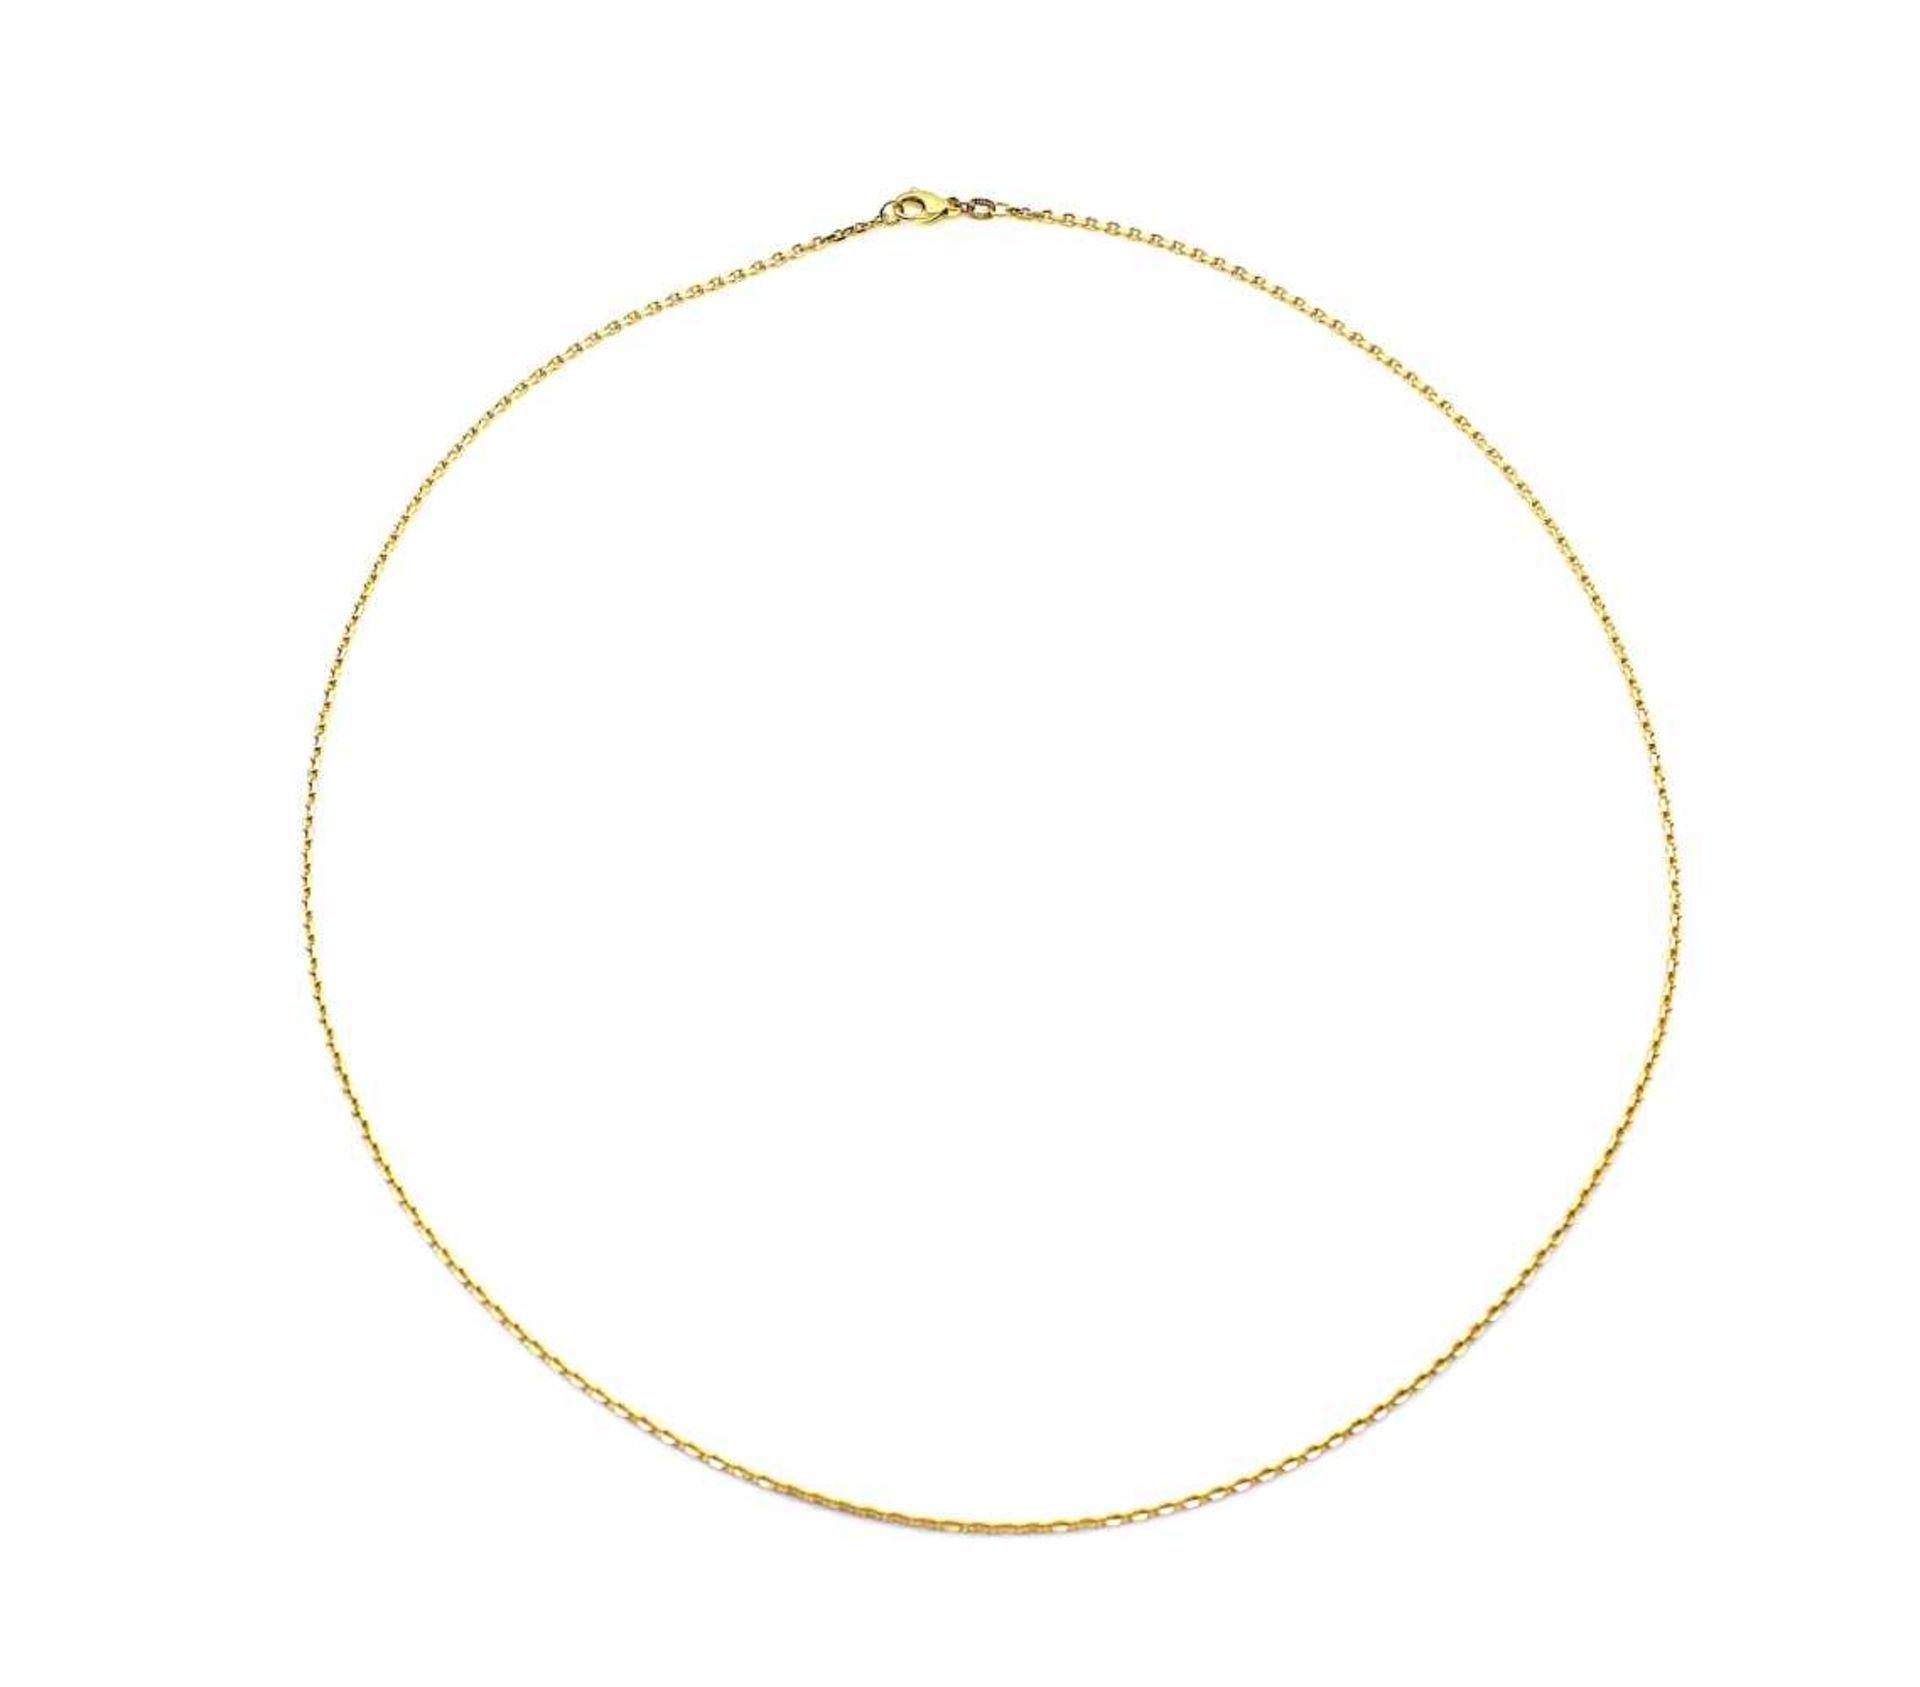 Los 48 - Kette 585 Gold, 8,6 g, Länge ca. 60 cm